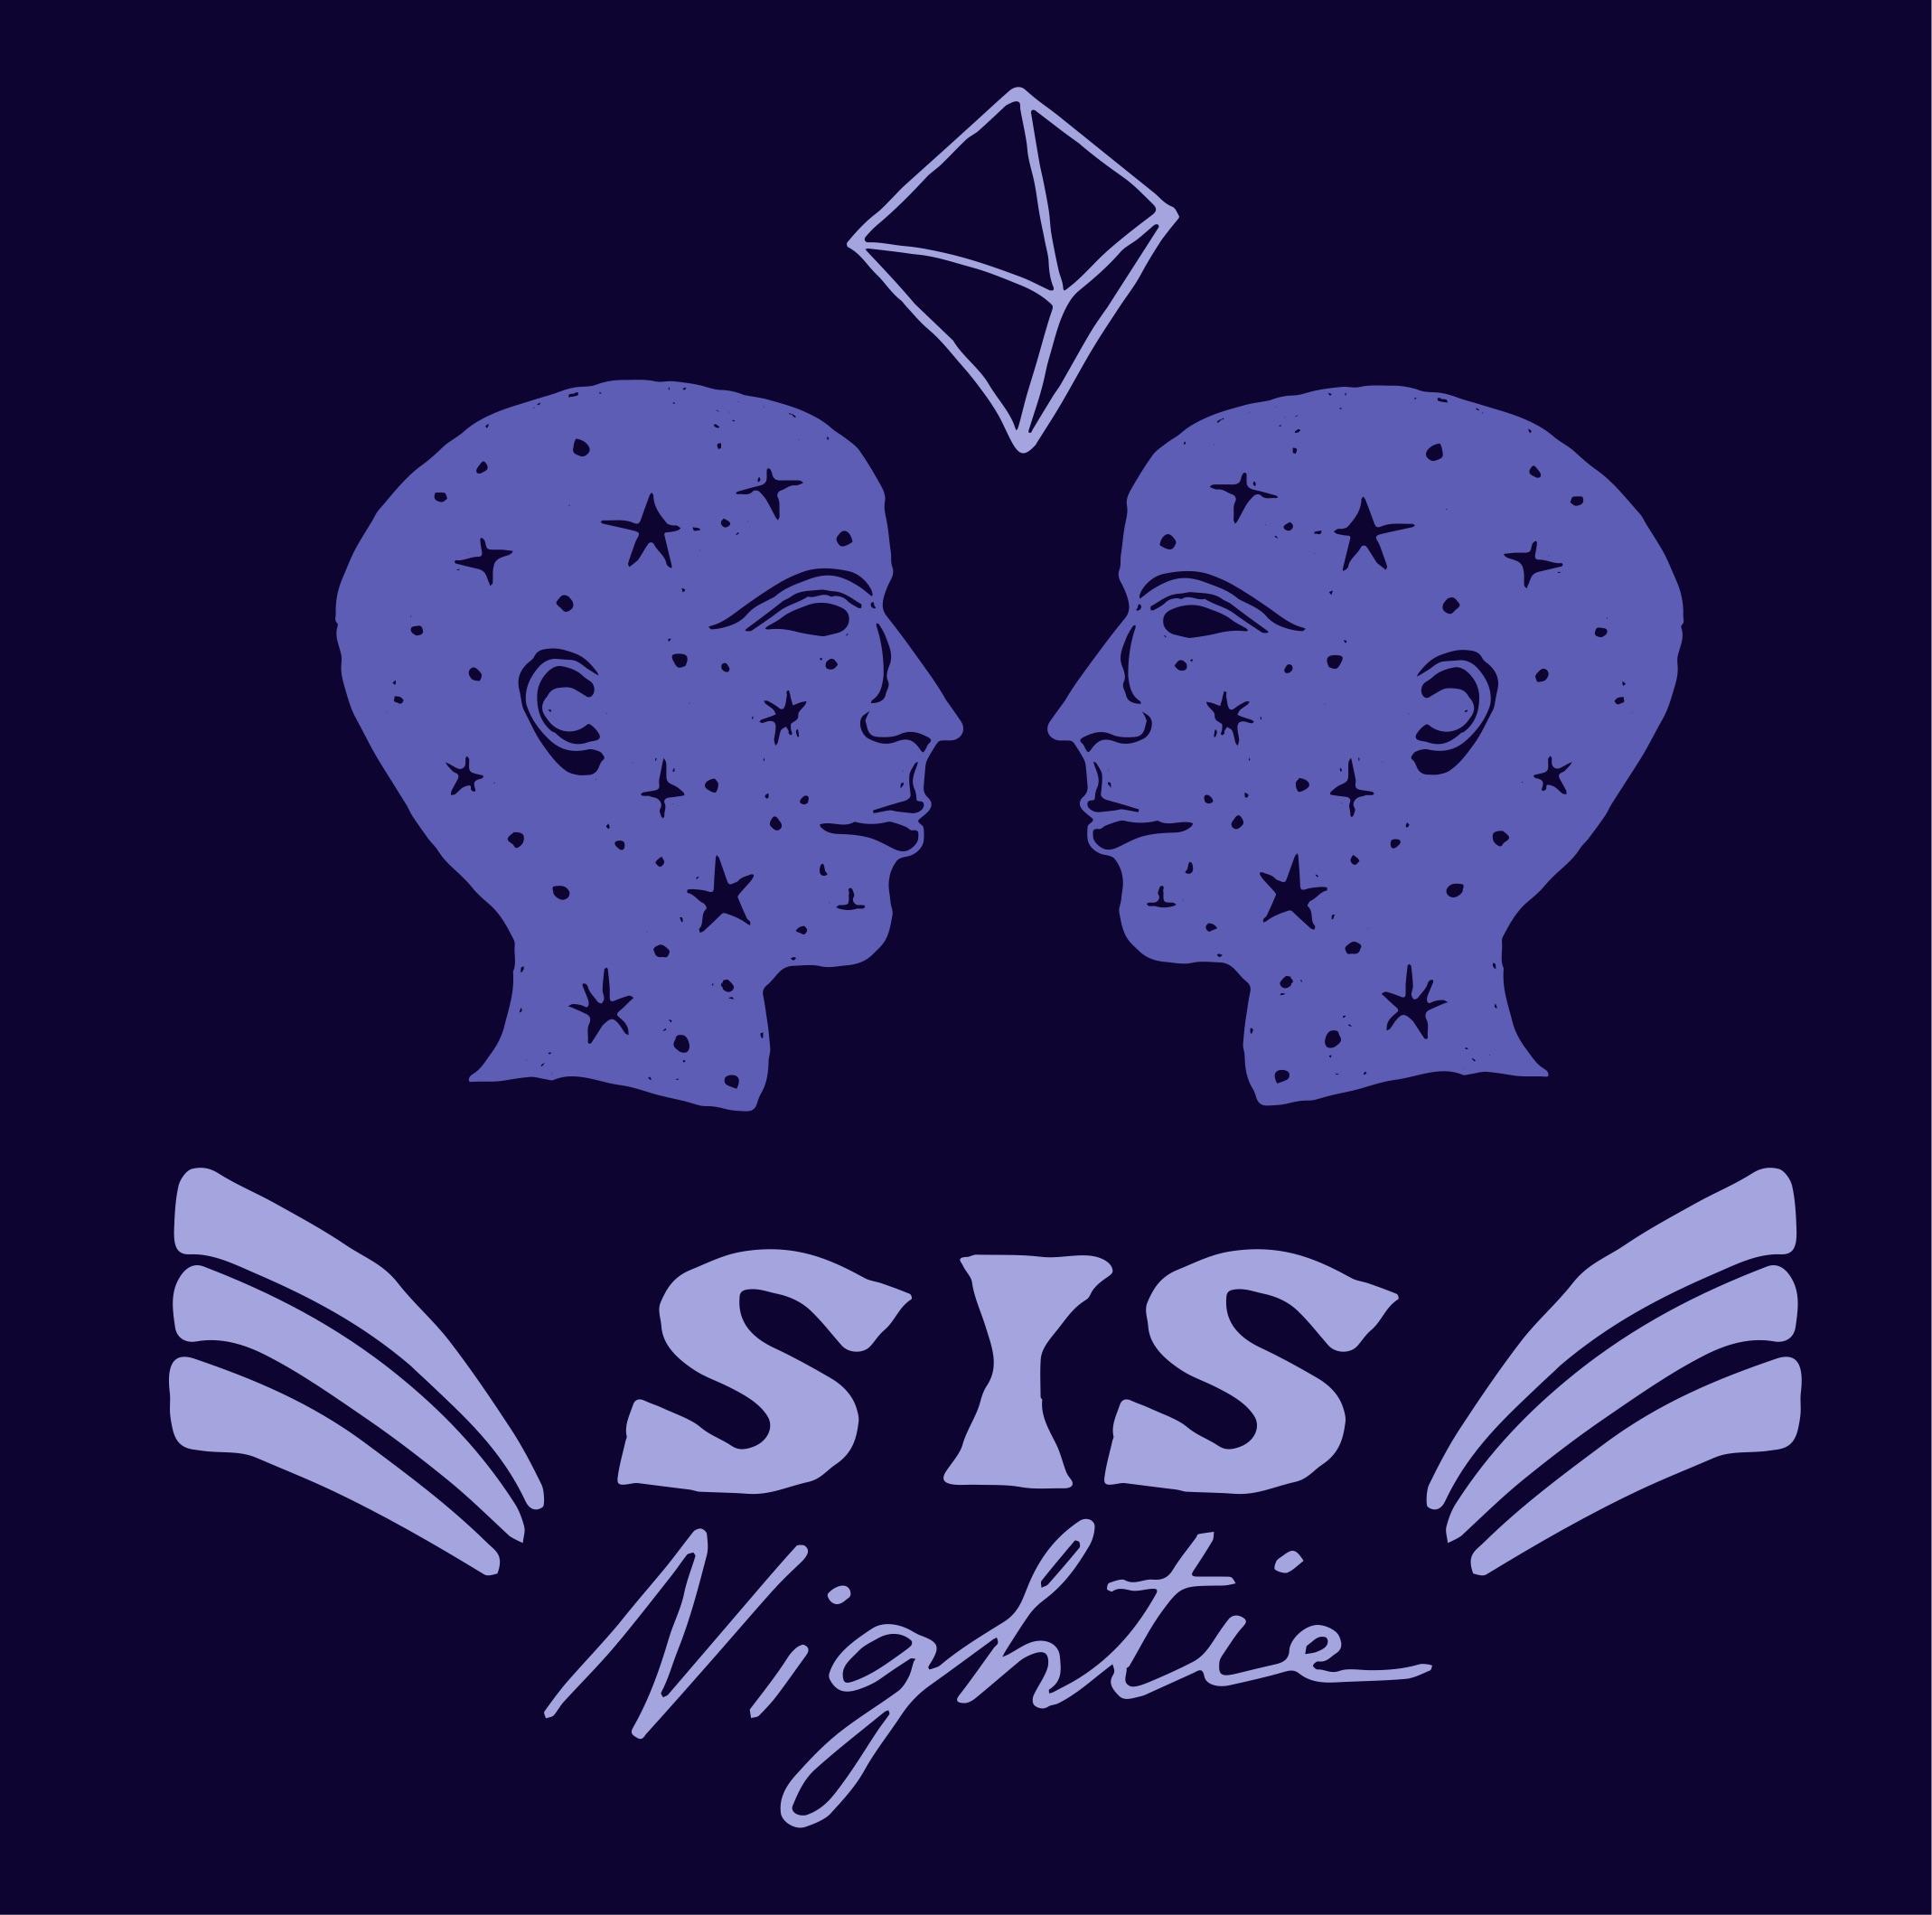 sis - nightie